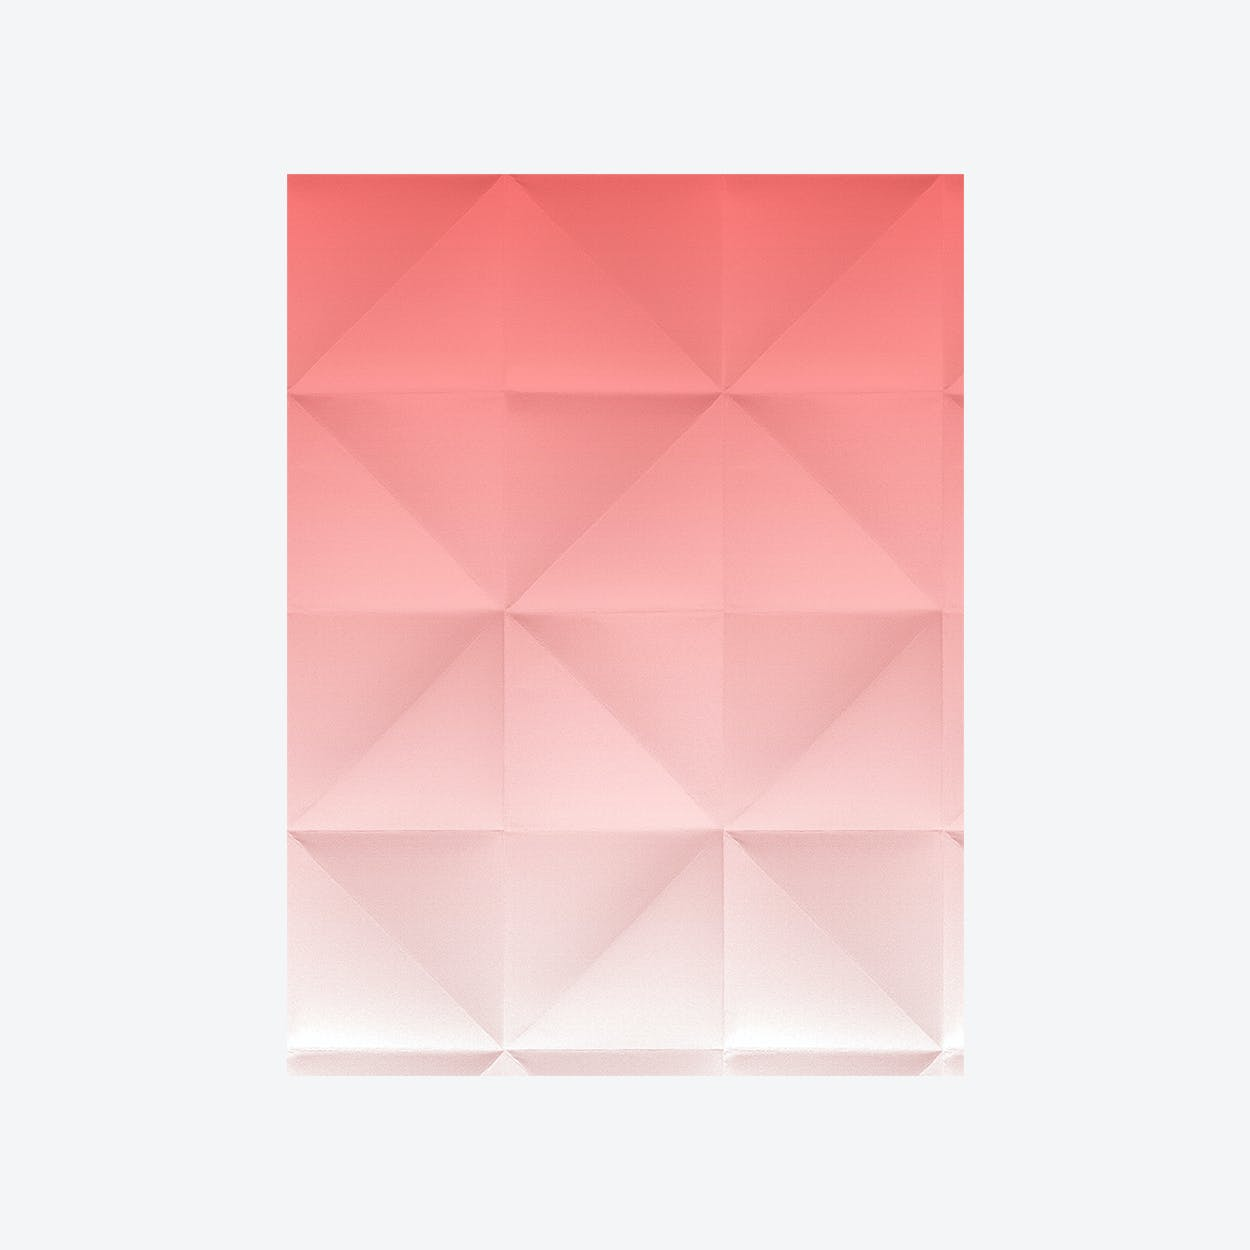 Floating - Wallpaper - Gradient Red